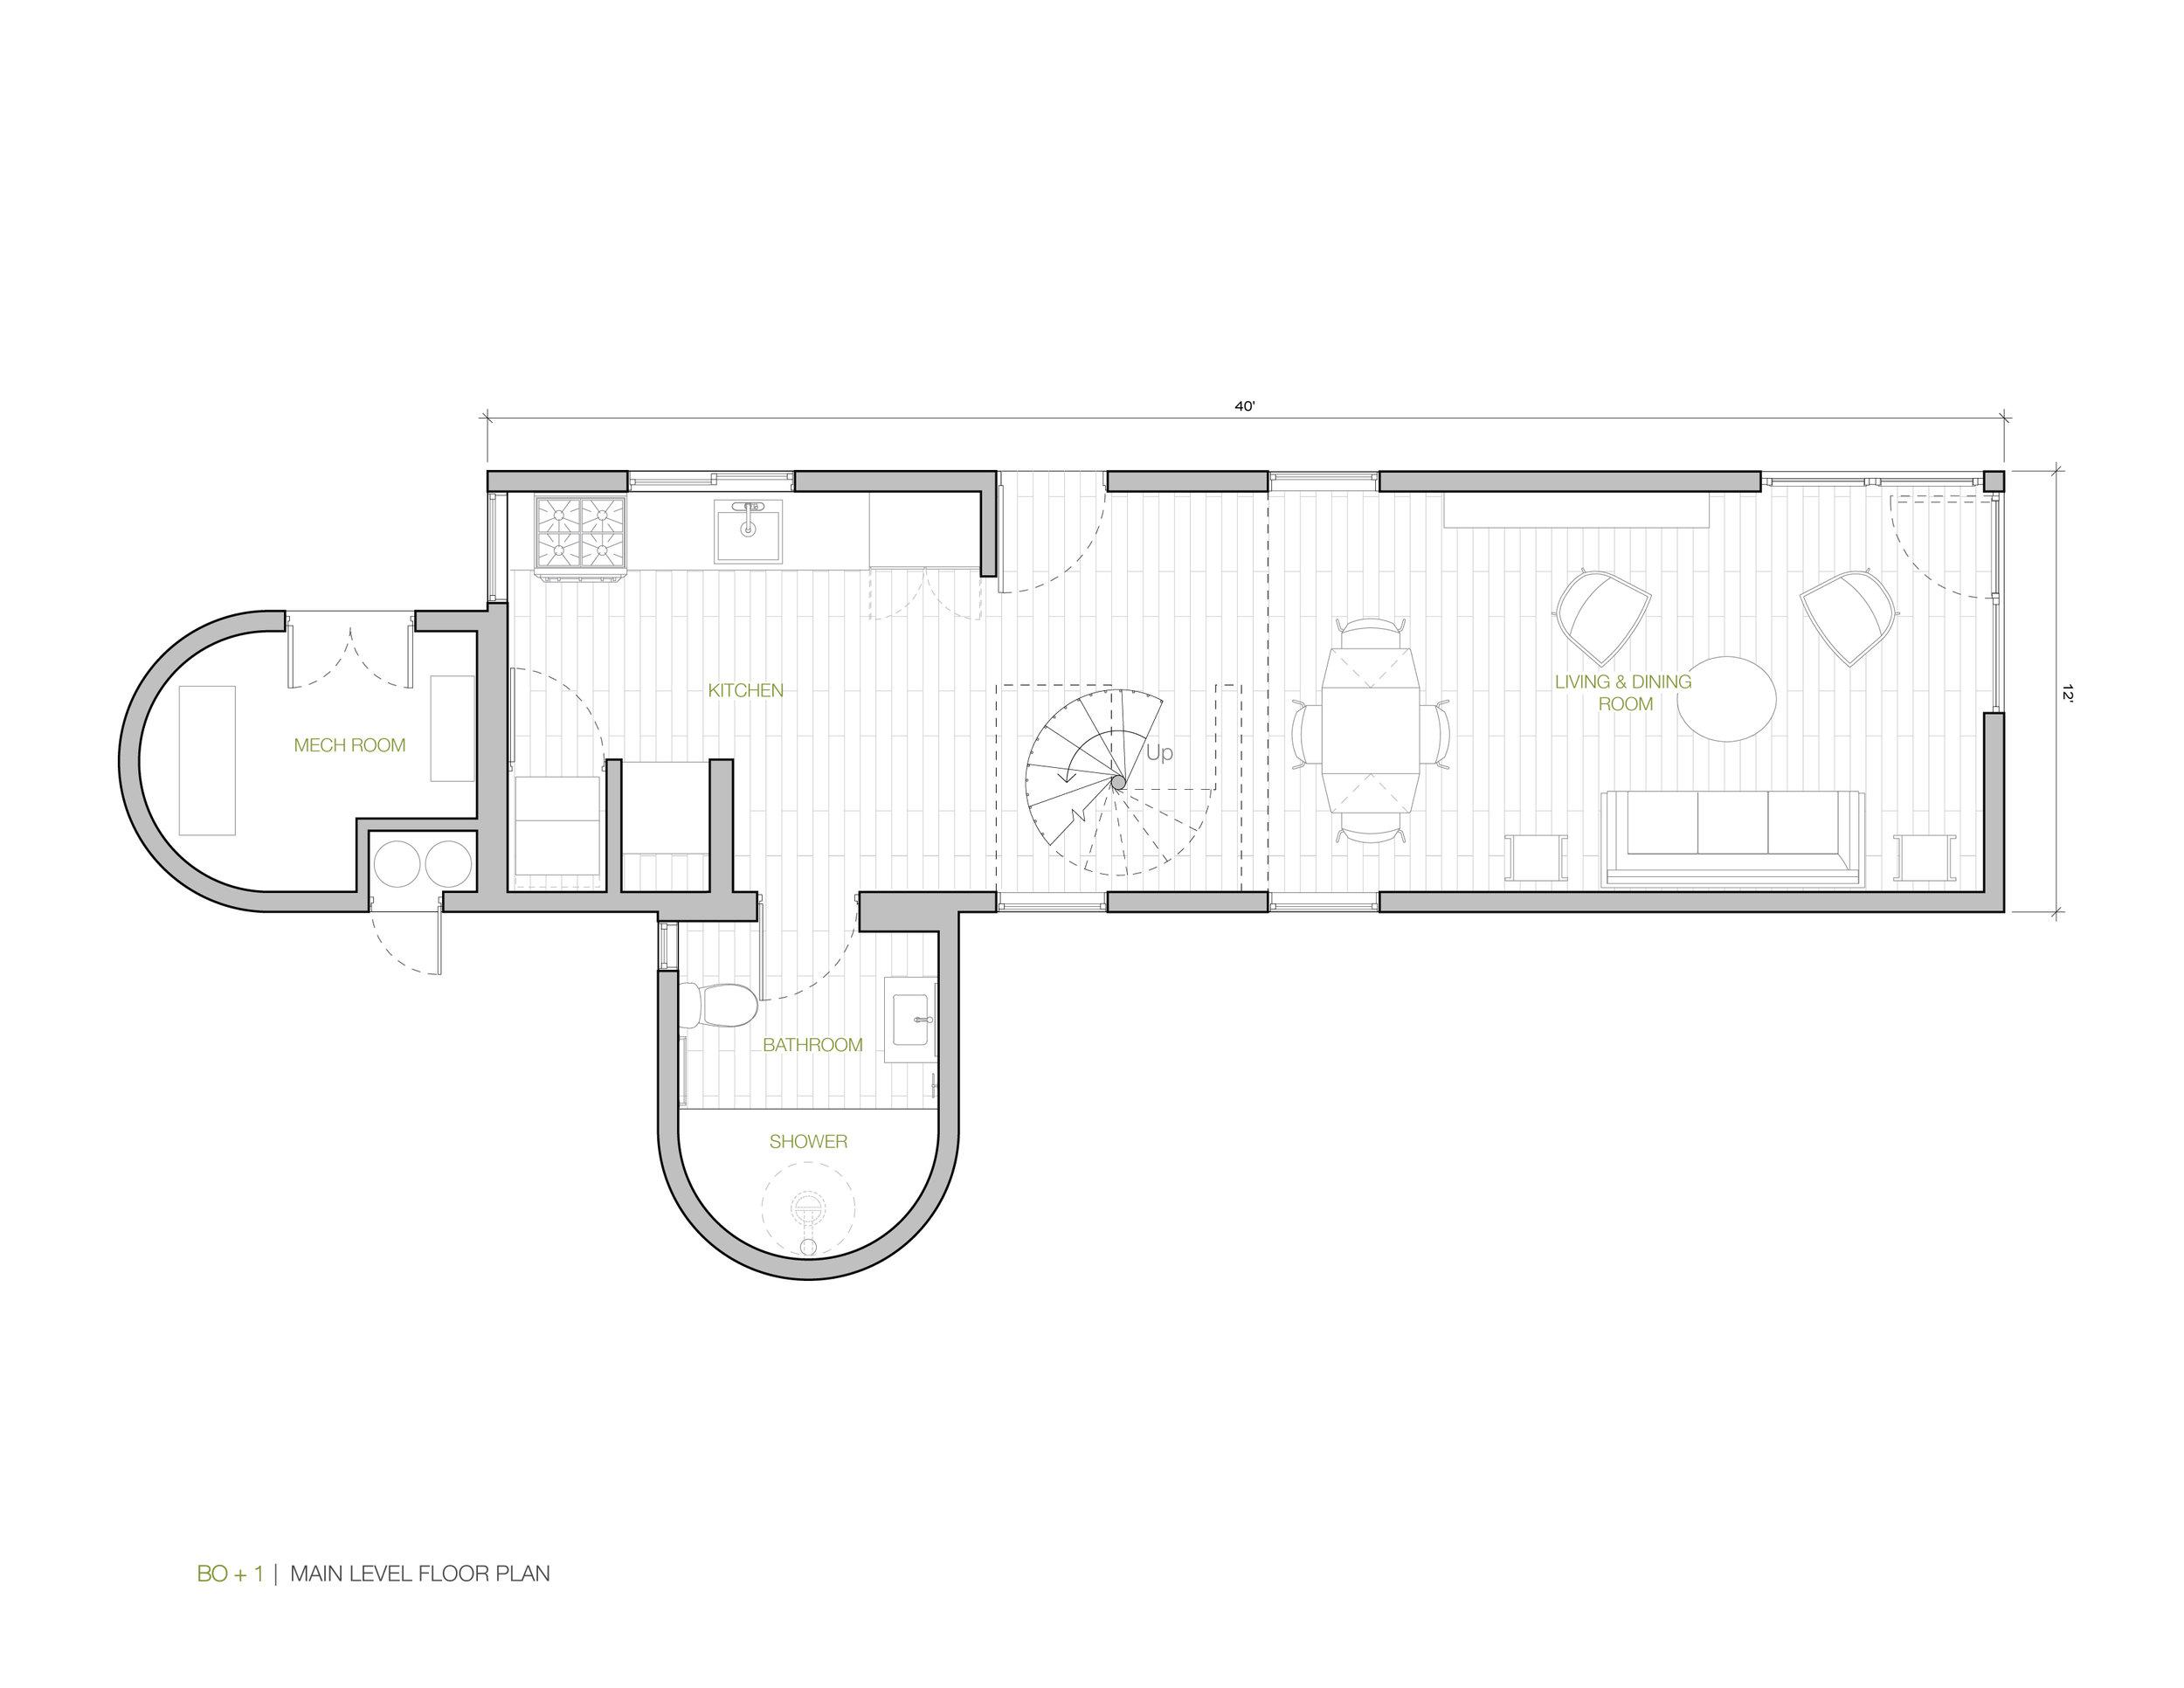 BO Floor plan-01.jpg